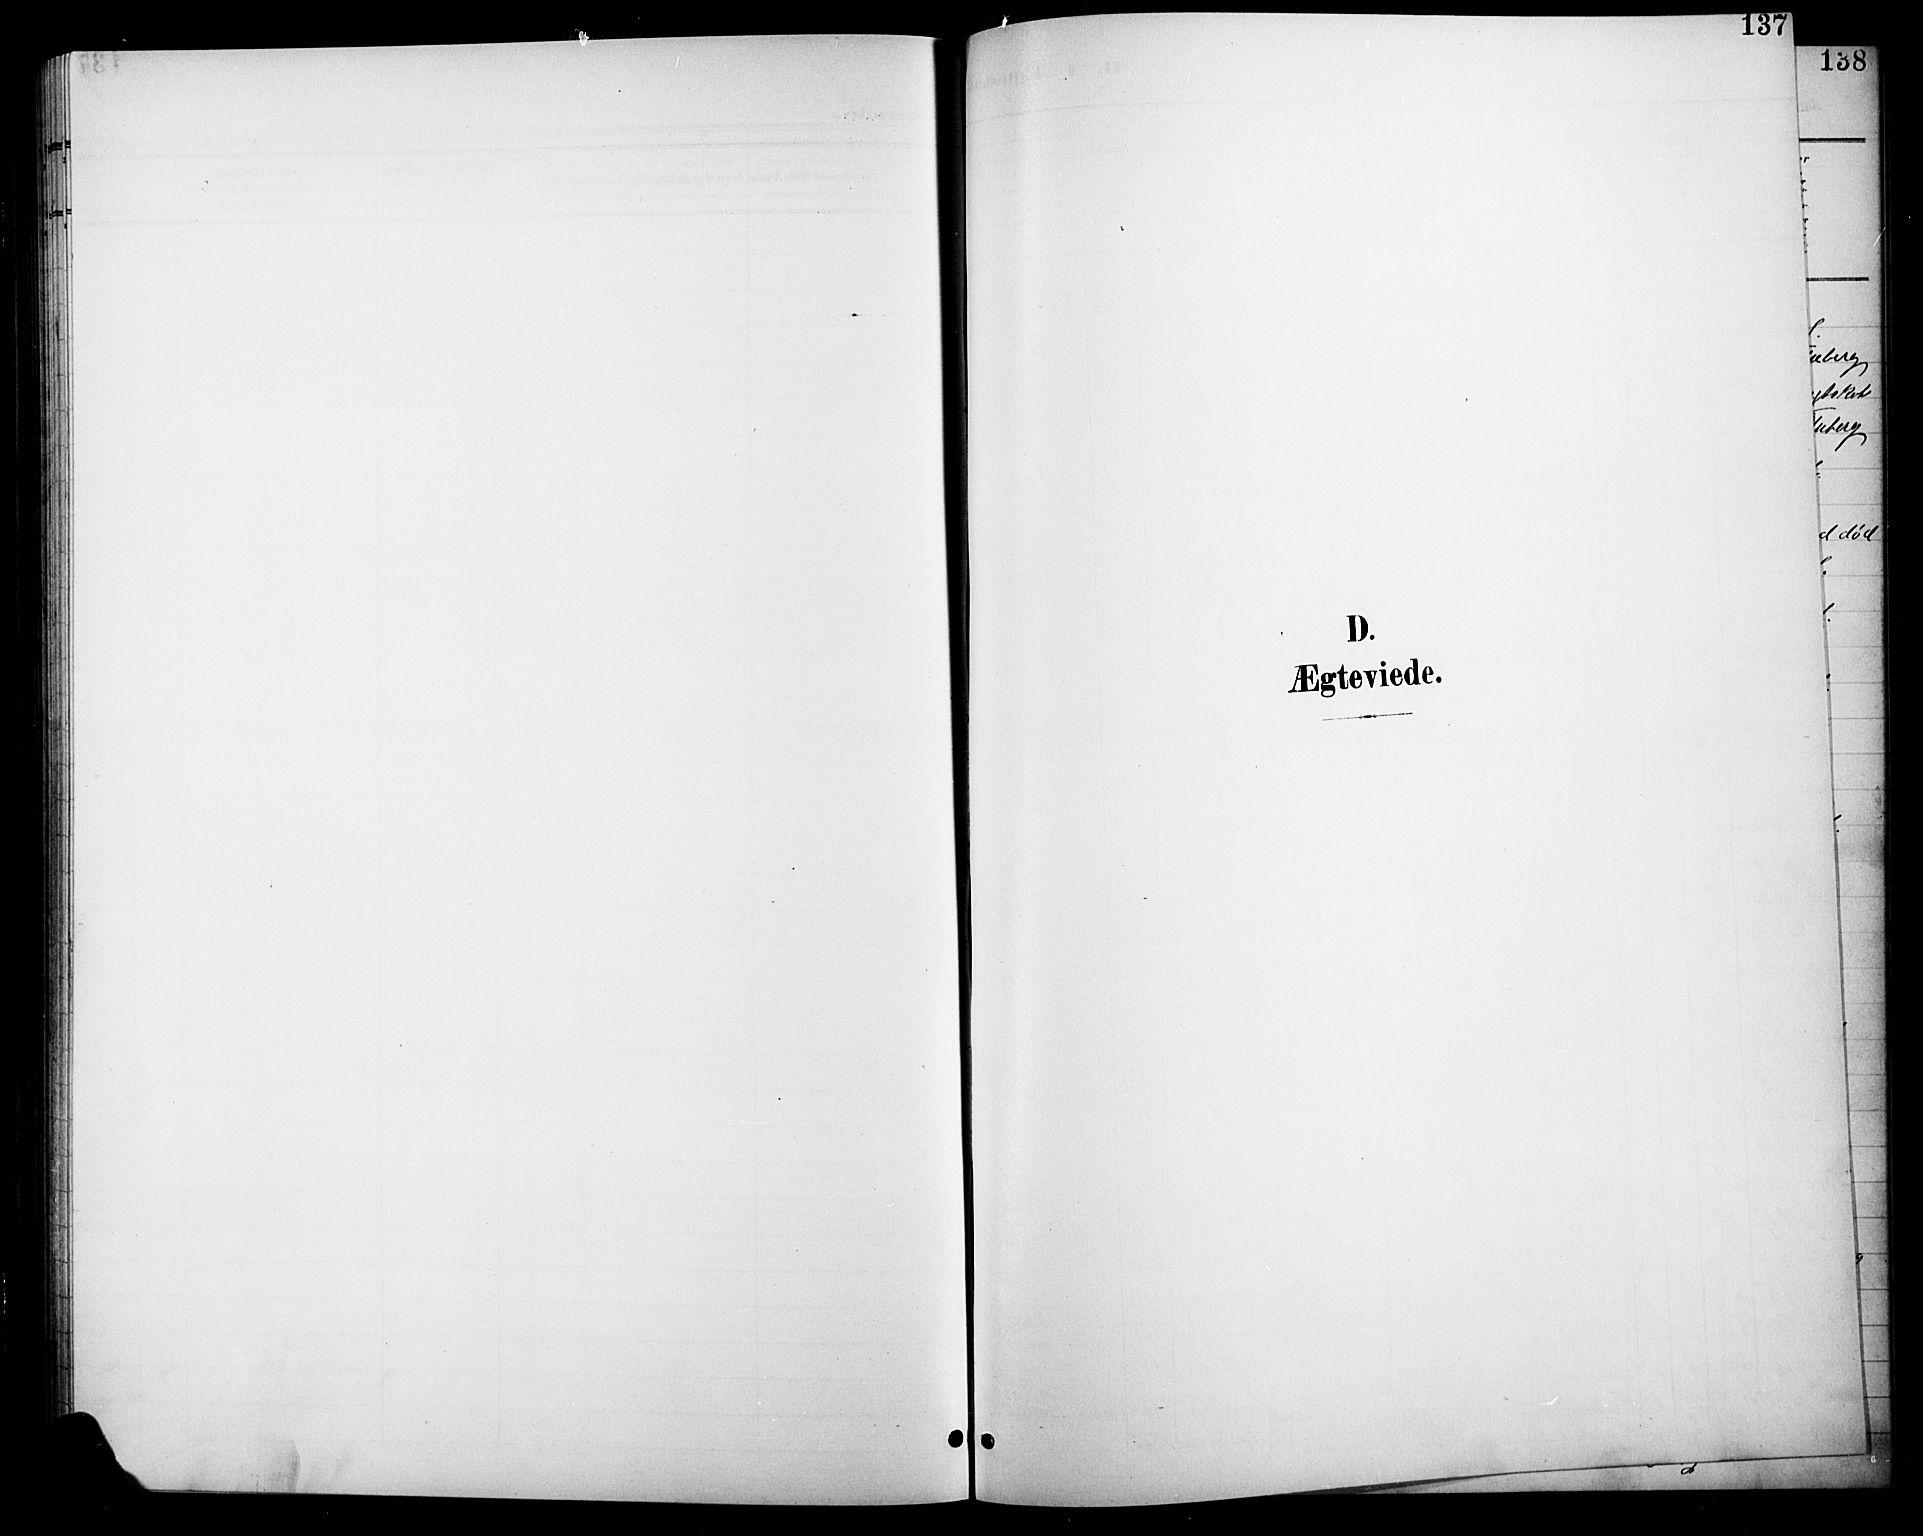 SAH, Søndre Land prestekontor, L/L0004: Klokkerbok nr. 4, 1901-1915, s. 137